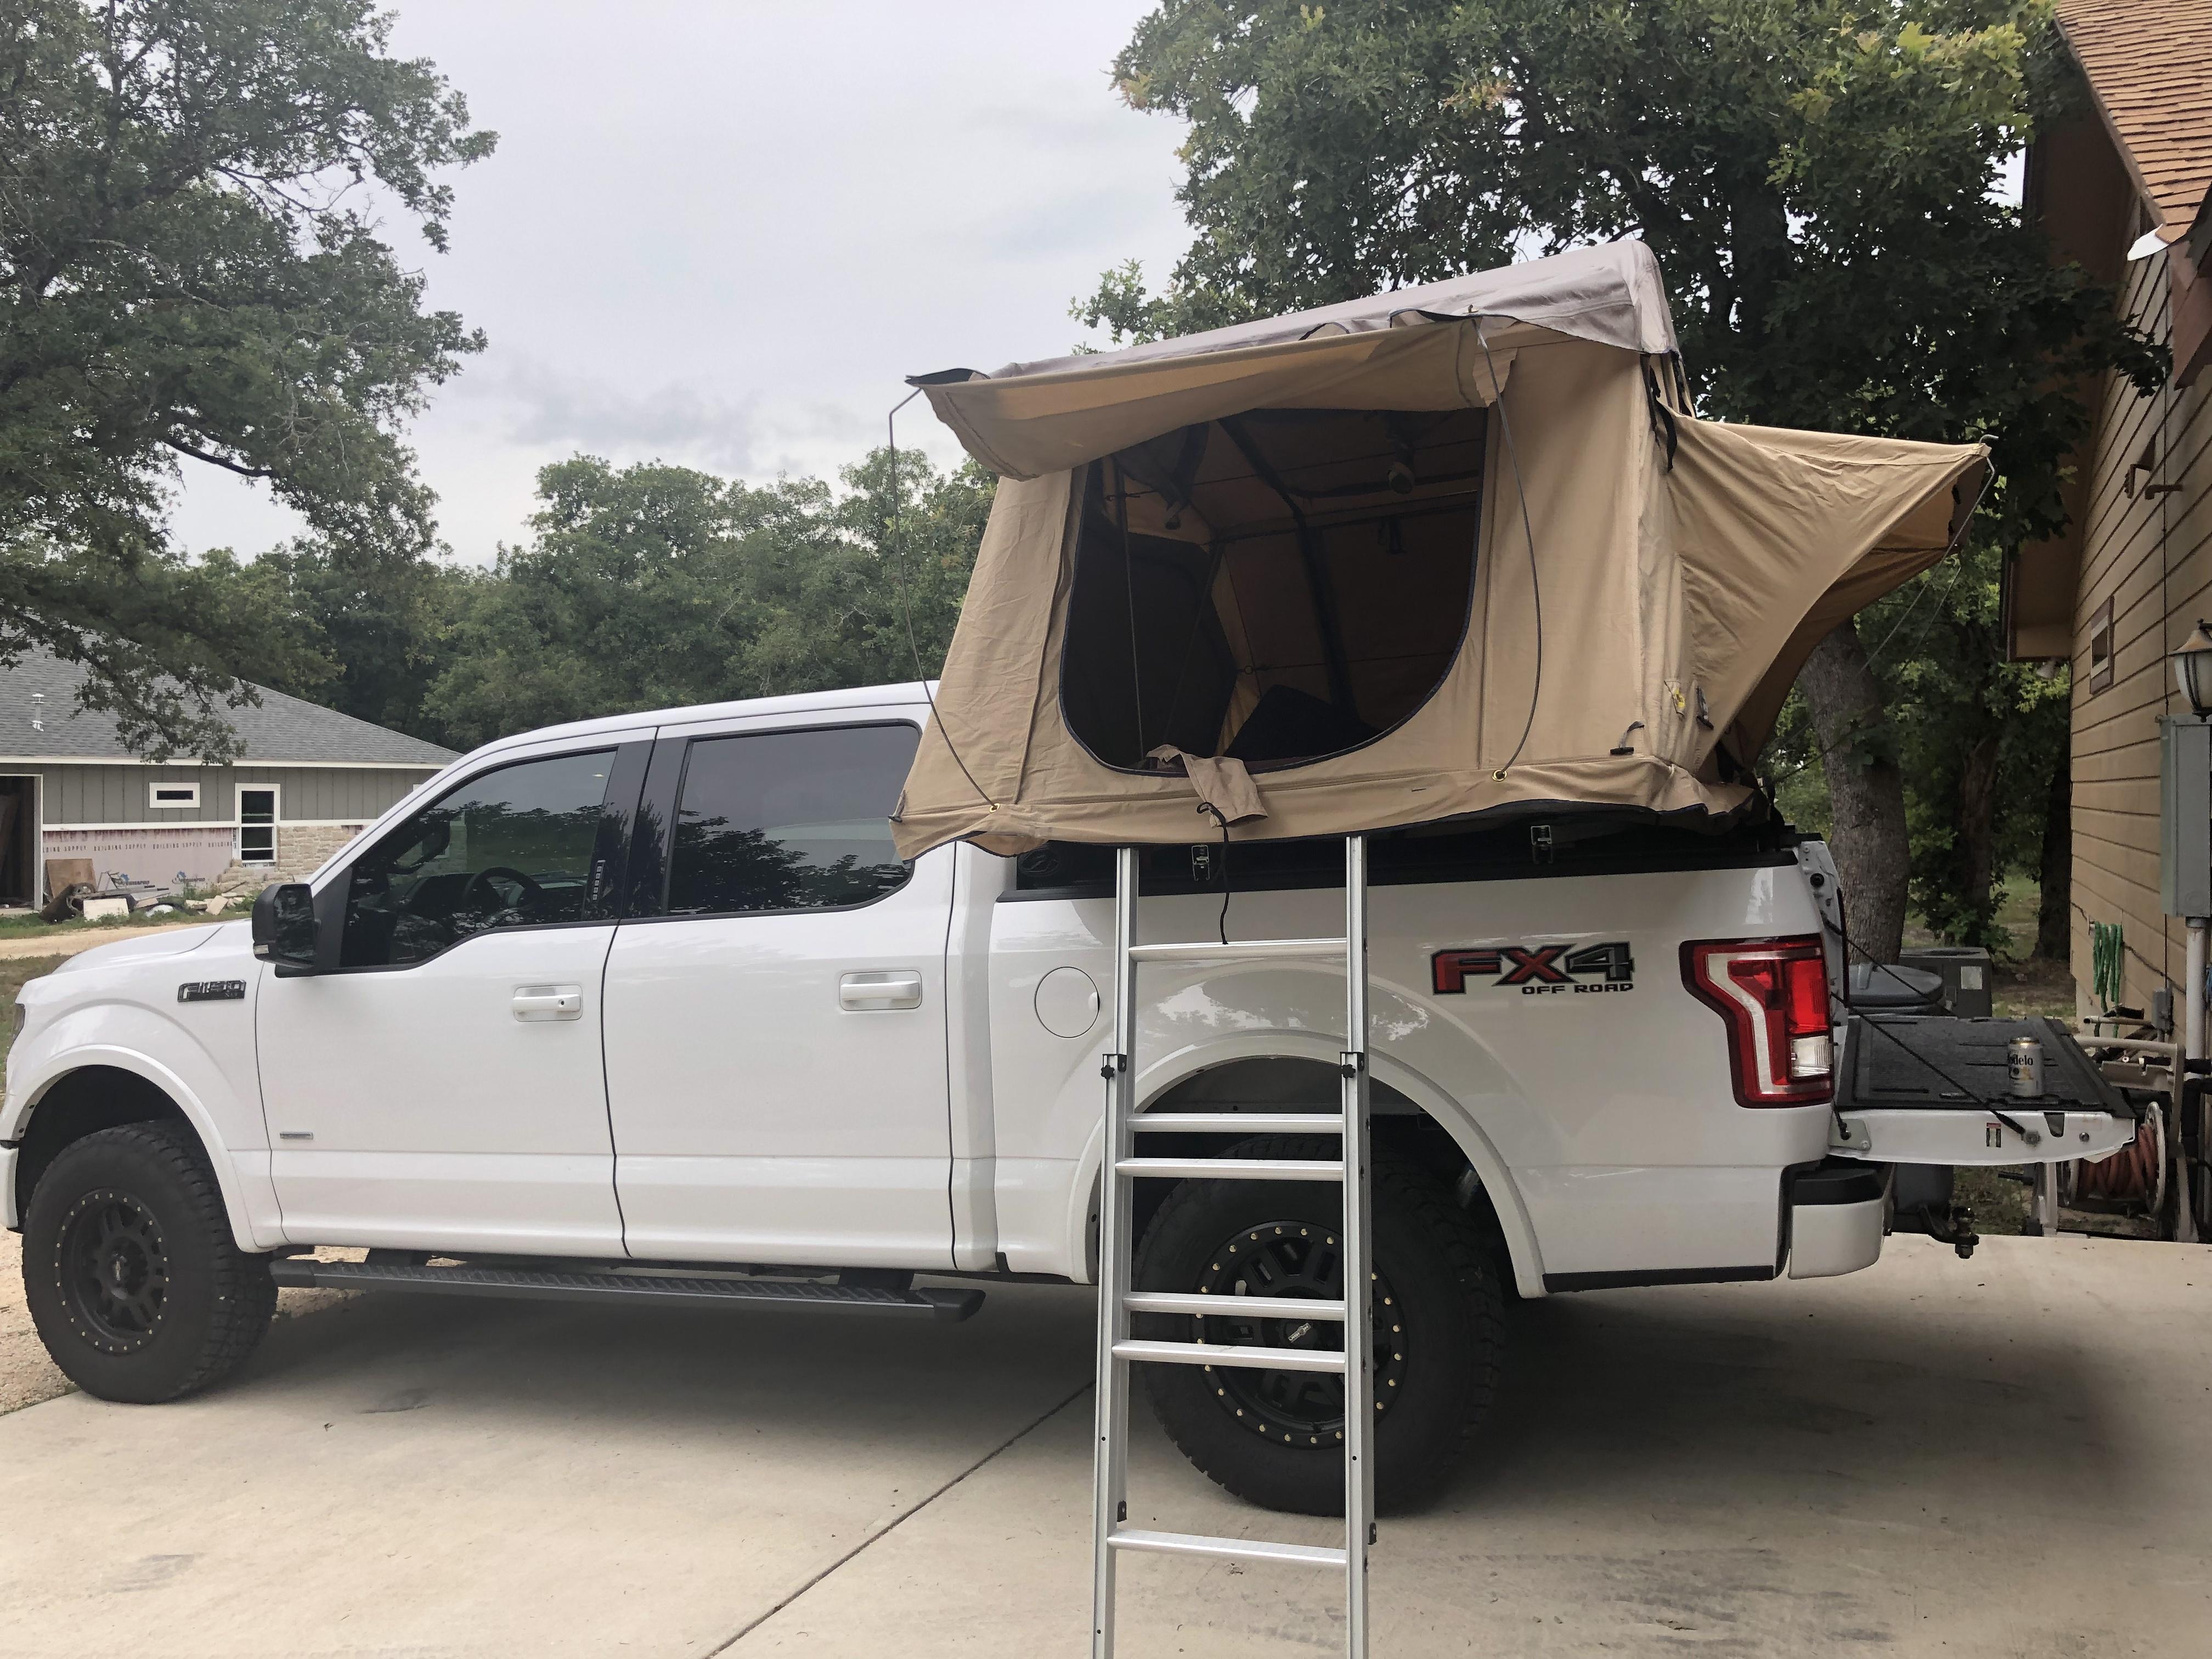 Smittybilt Overland Tent 2783